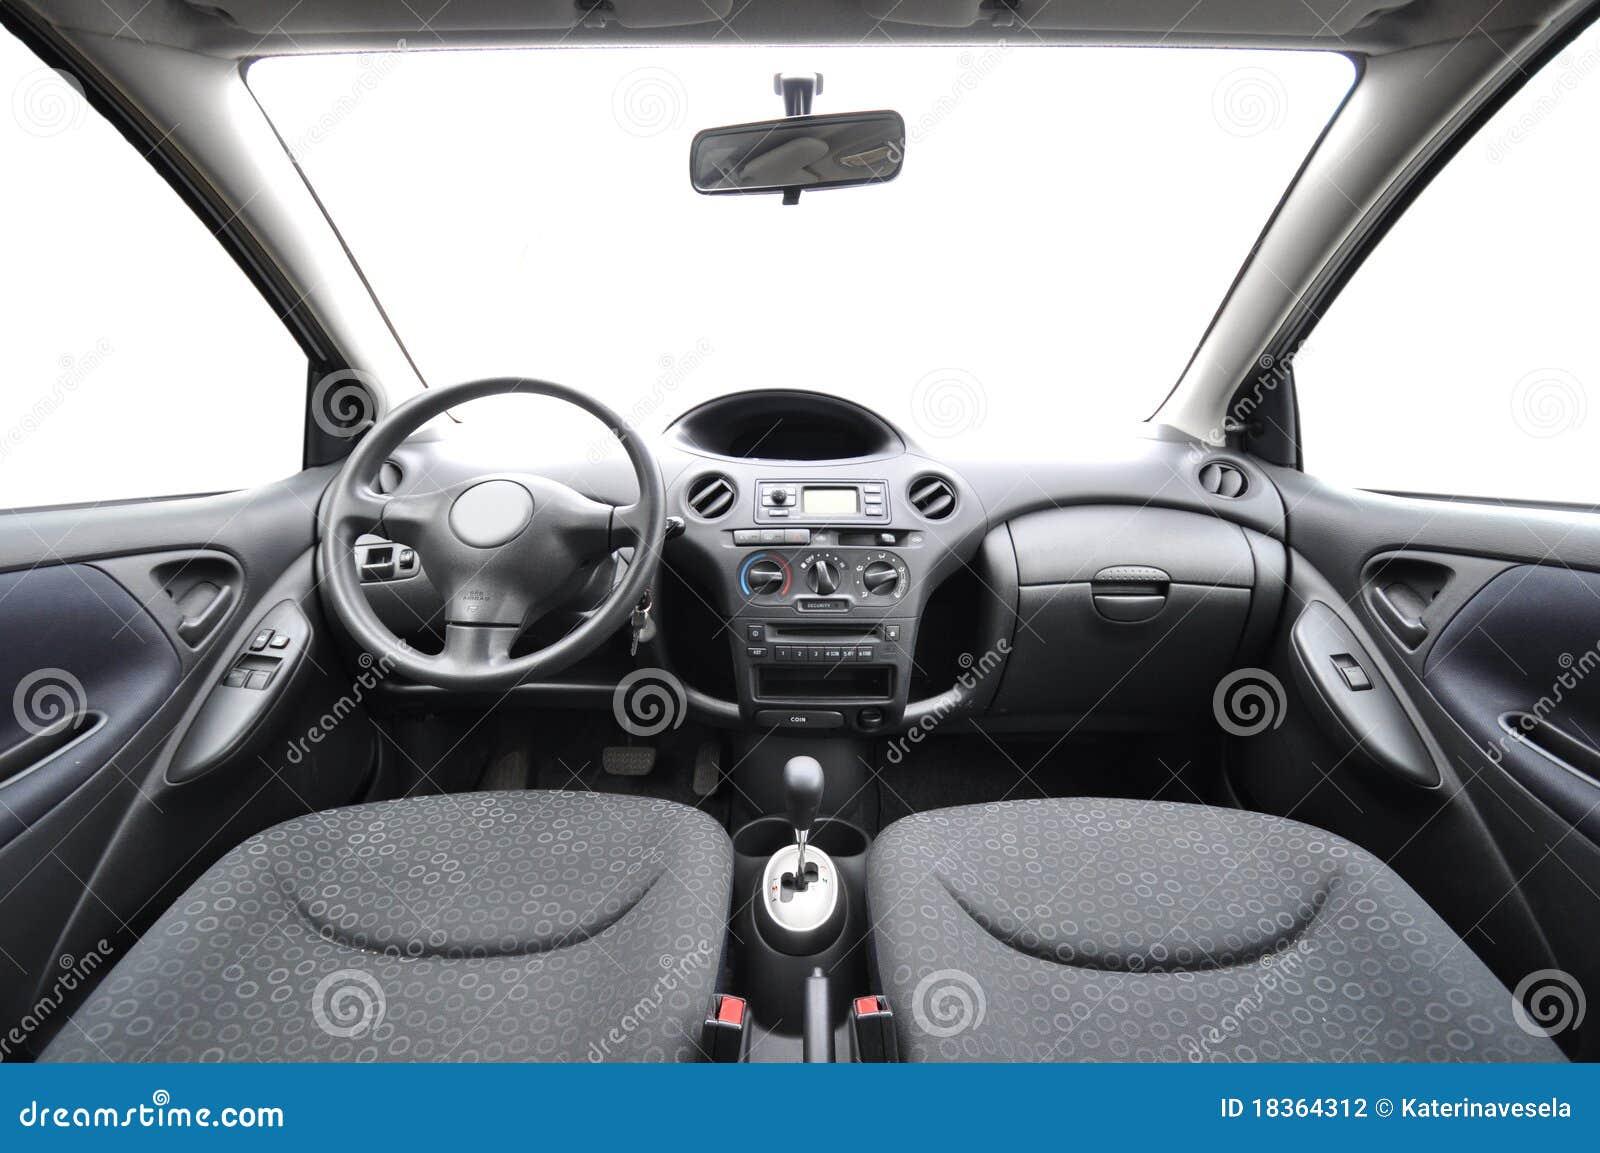 car interior stock photography image 18364312. Black Bedroom Furniture Sets. Home Design Ideas